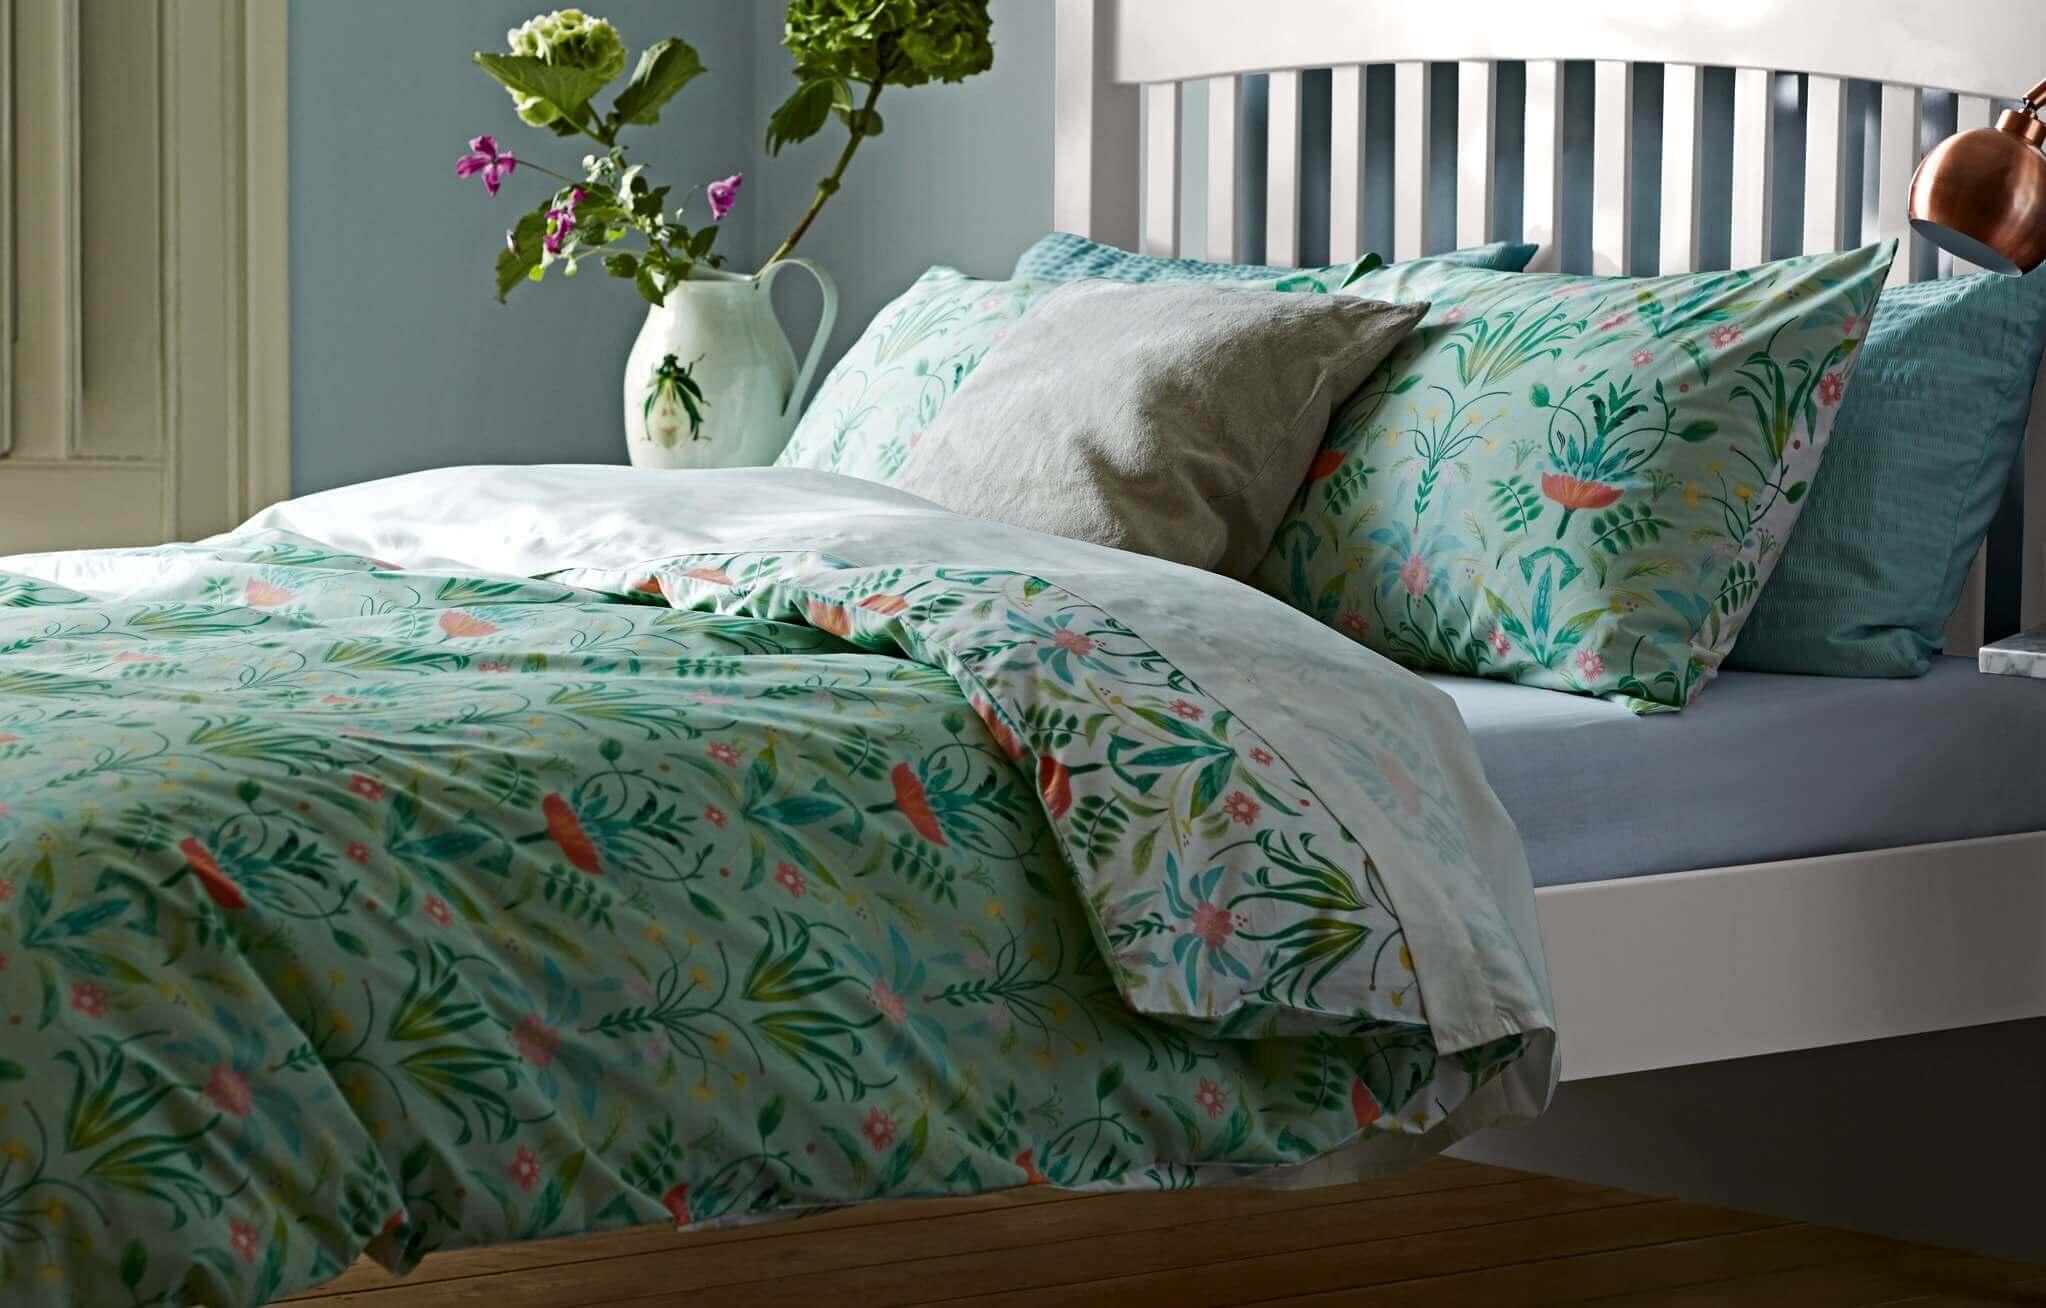 Summer-ready bedding sets